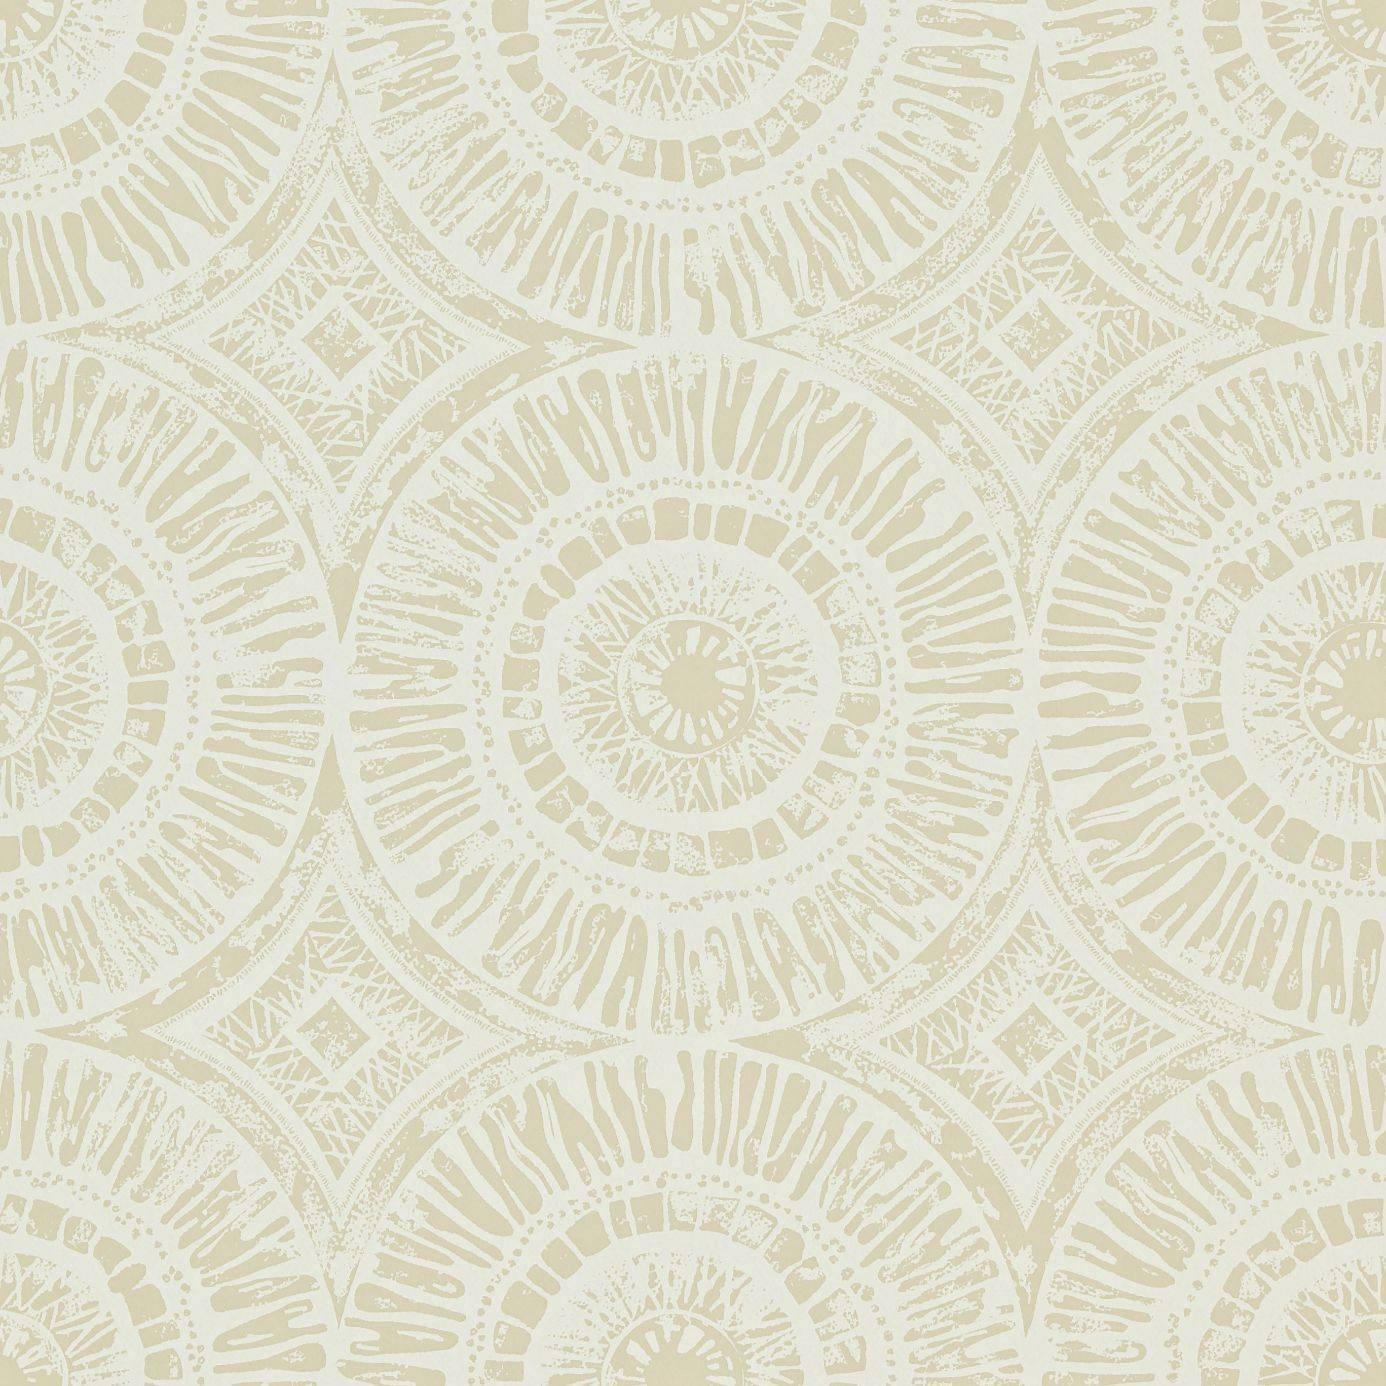 Scion Wabi Sabi Wallpapers Suvi Wallpaper - Linen - 110469. Loading zoom